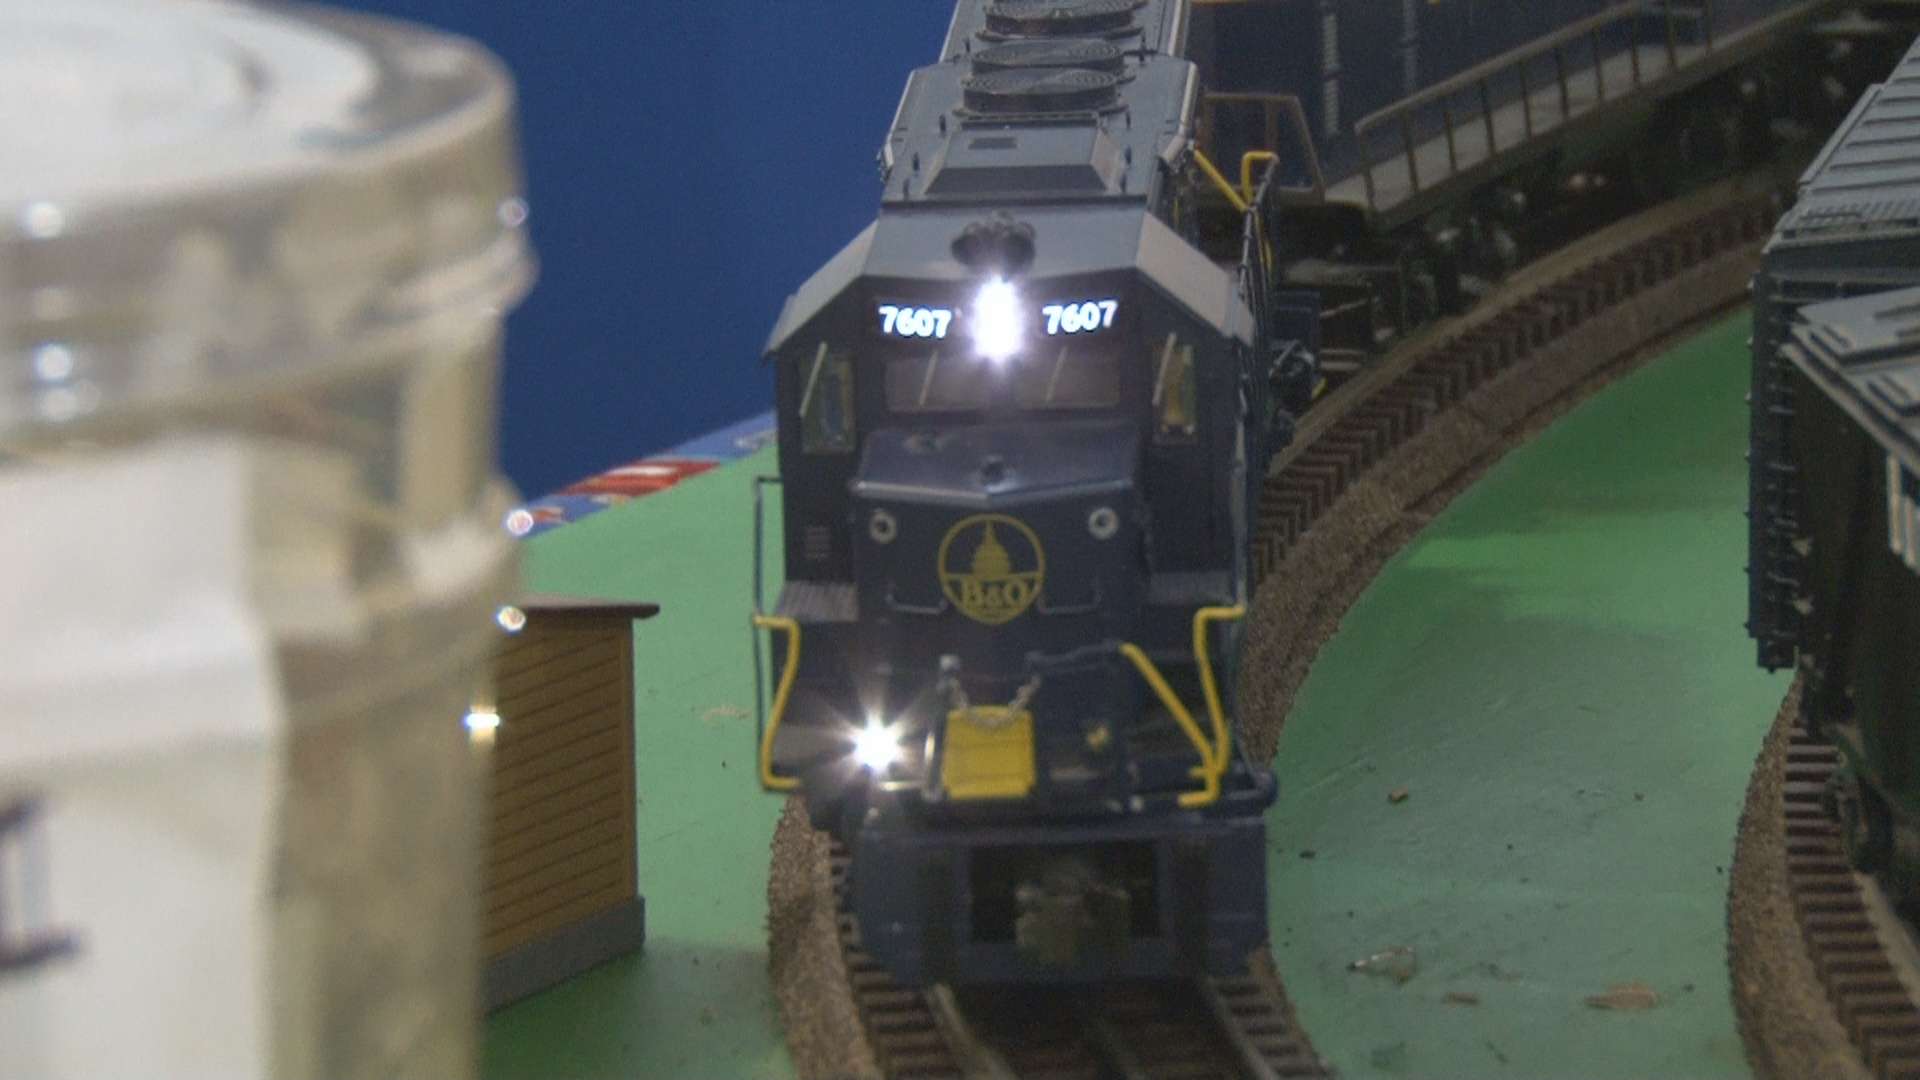 clarksburg railroad 2_1542339184235.jpg.jpg